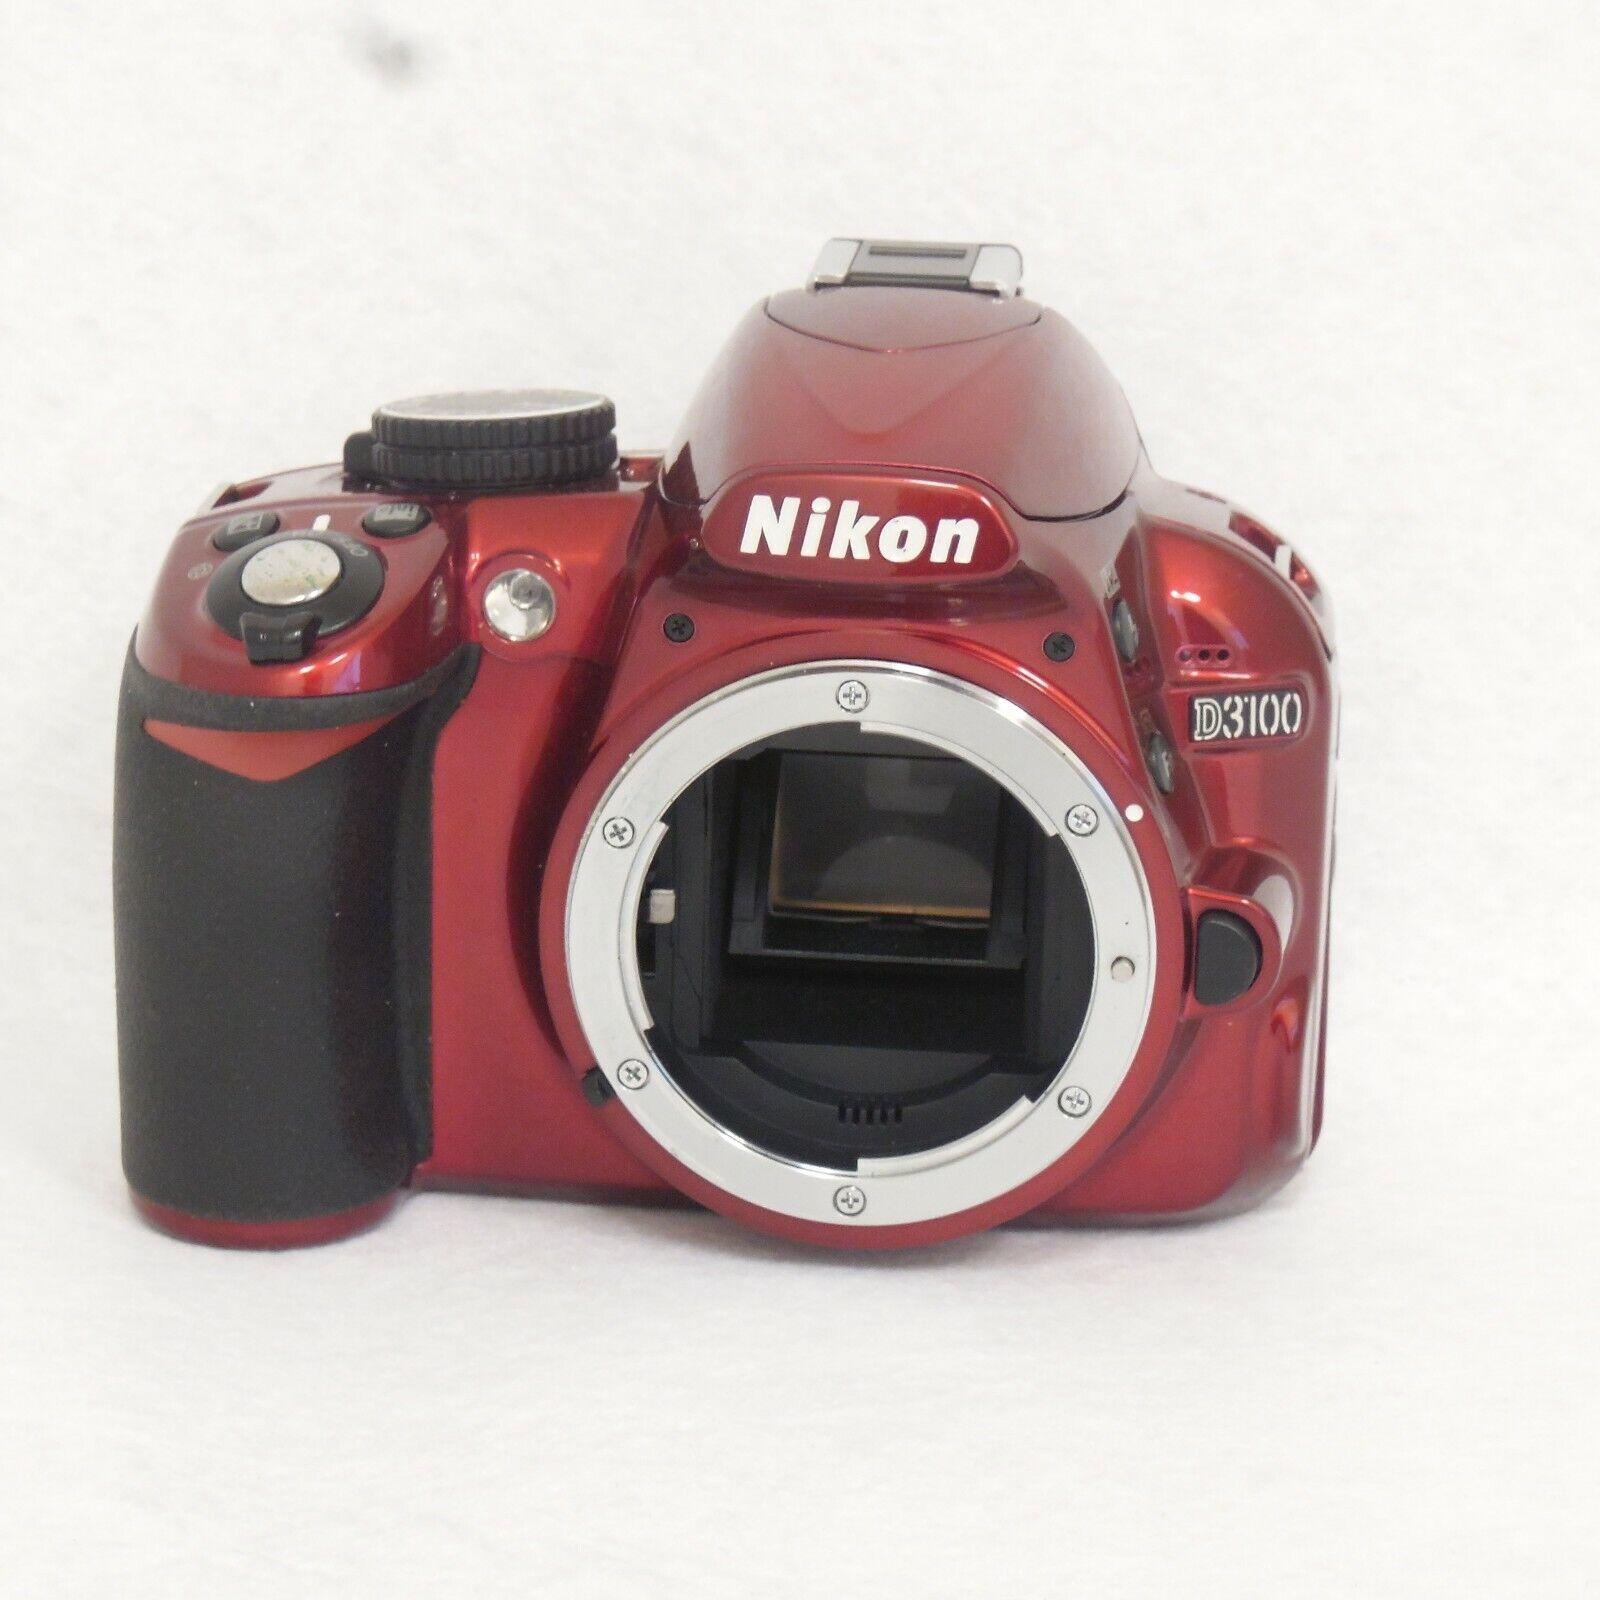 nikon-d3100-14-2mp-digital-slr-camera-body-red